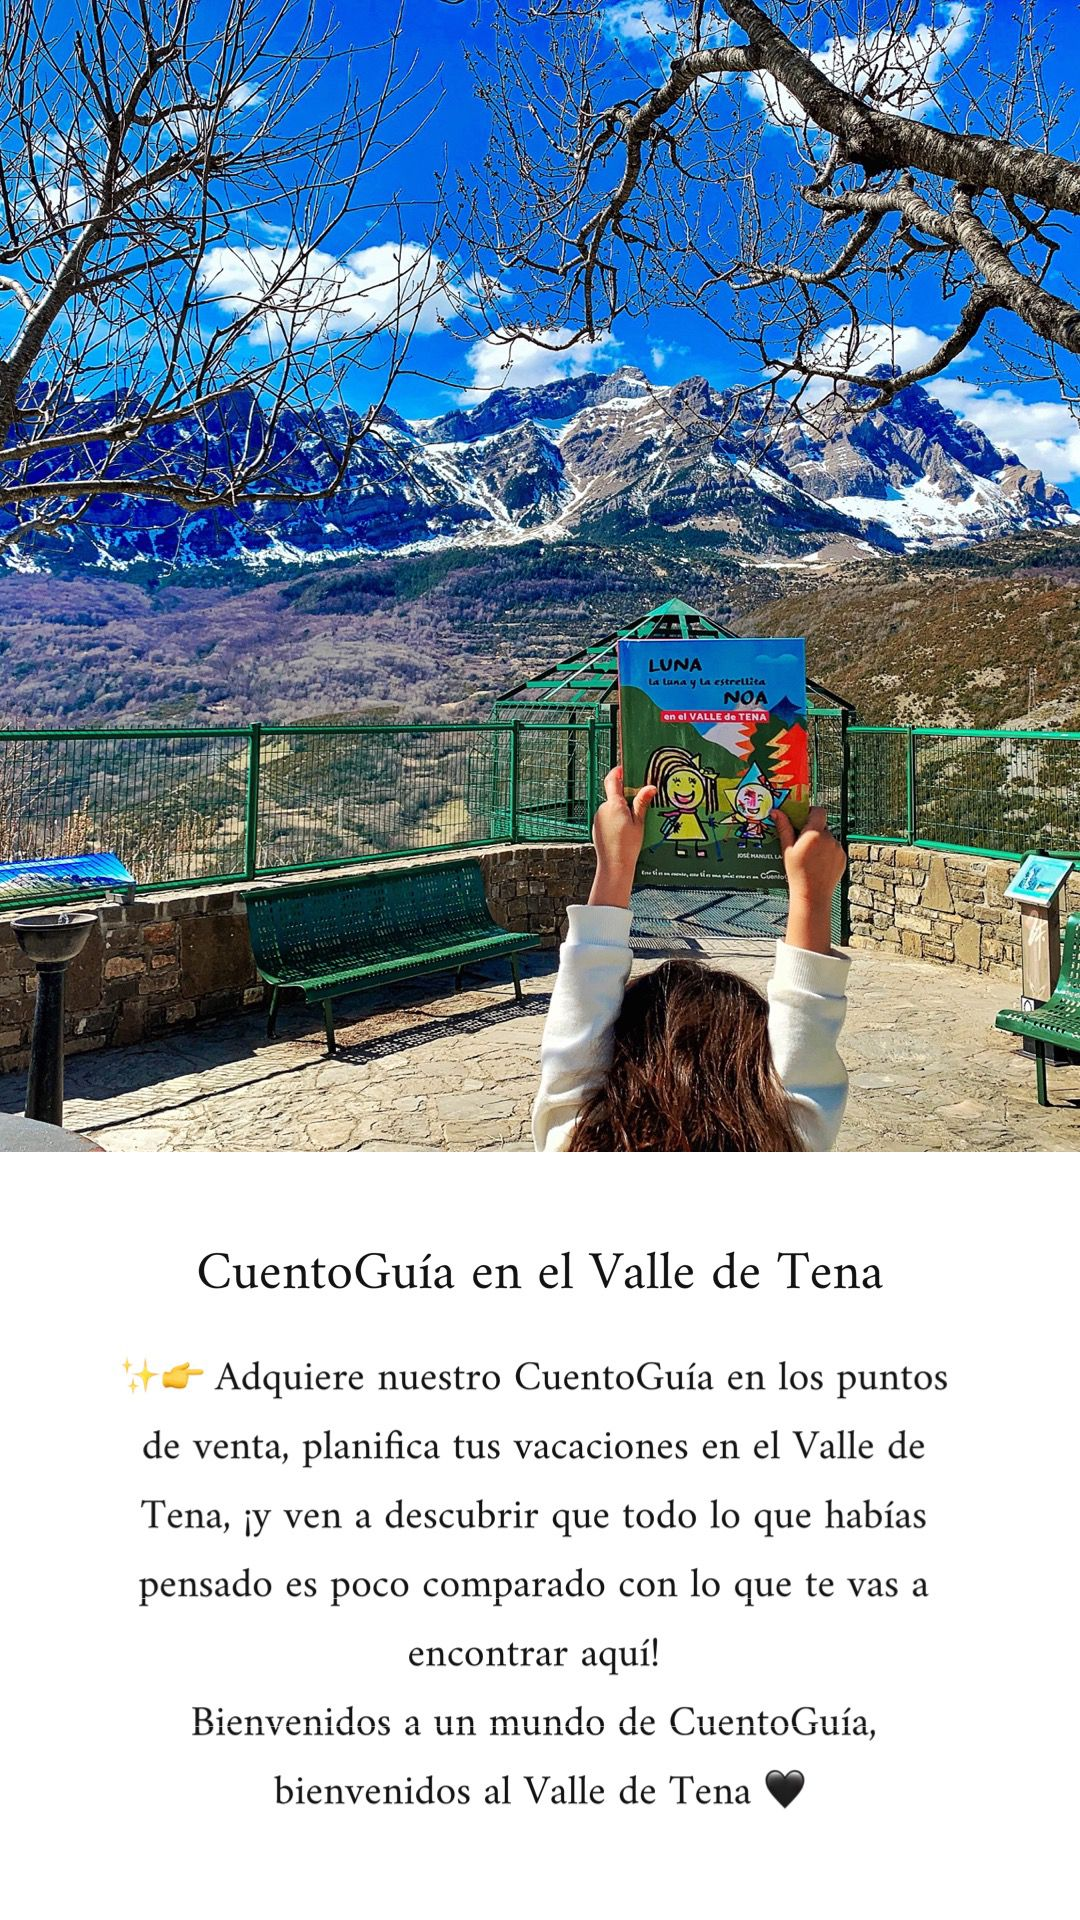 Tirolina Valle De Tena Hoz De Jaca Valle De Tena Pirineos Huesca Aragón En Familia Valle Nombres De Personajes Actividades Acuáticas